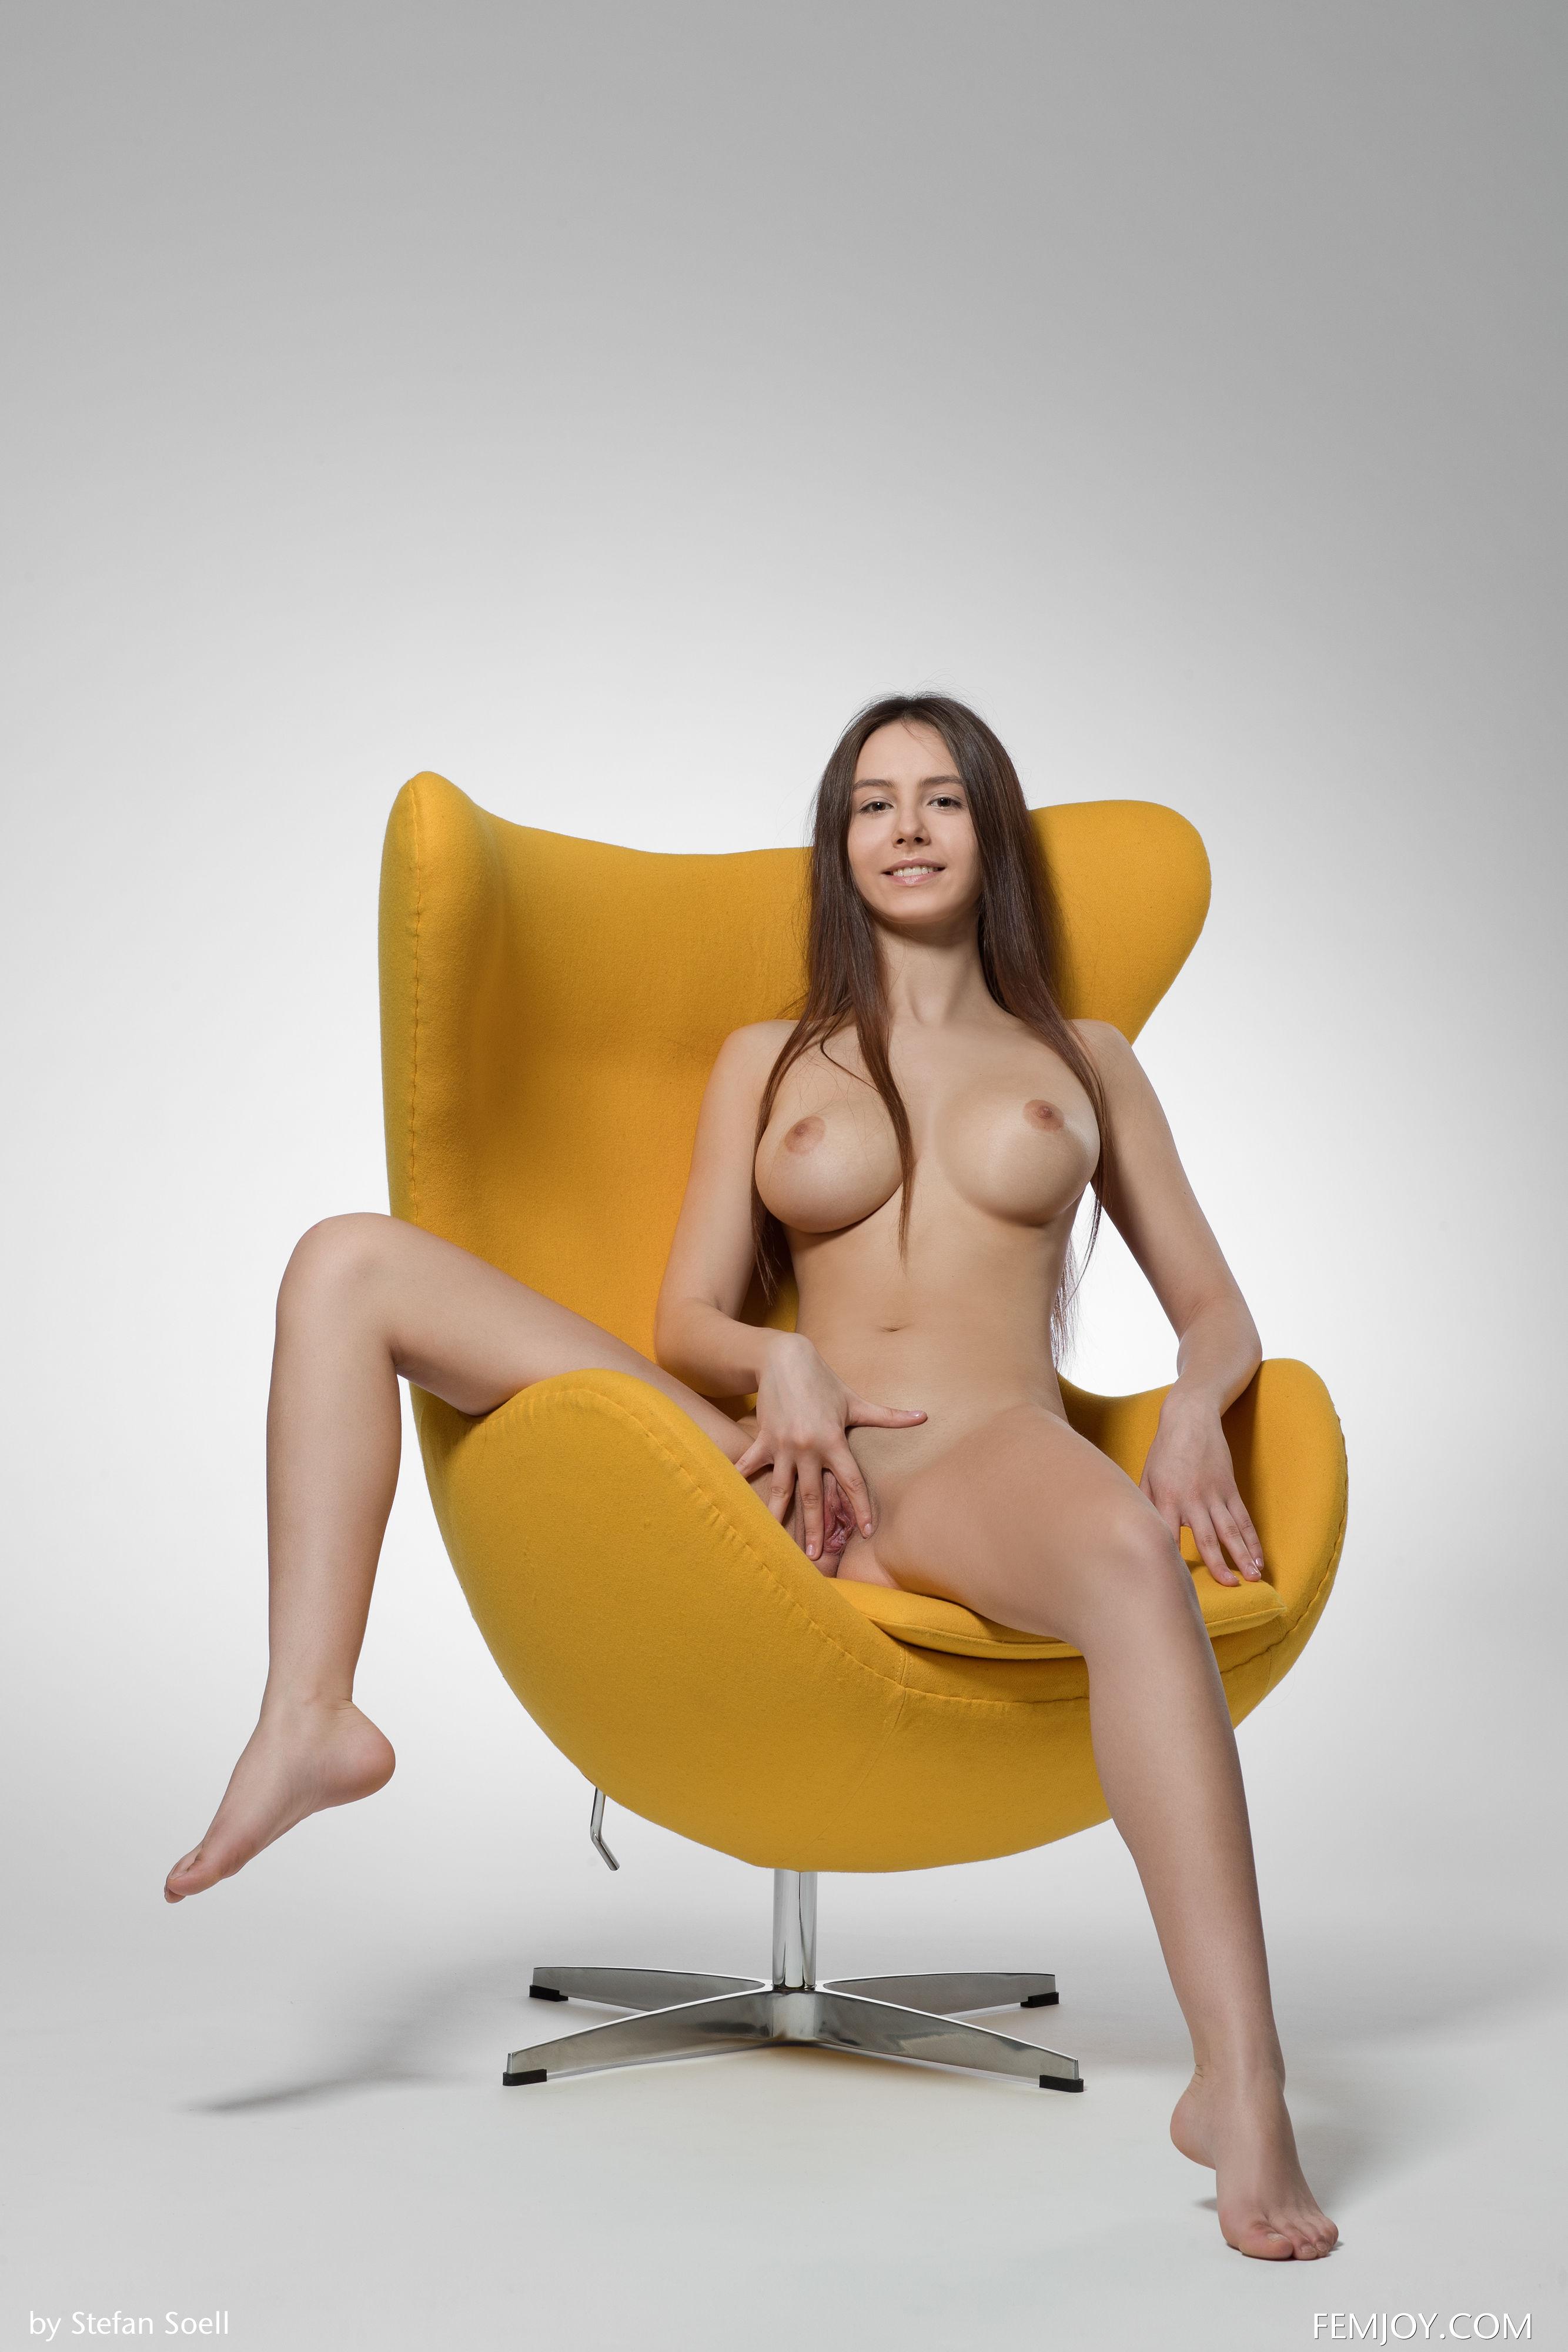 76857702_alisai_femjoy_stefansoell_yellow_19052018p_39.jpg